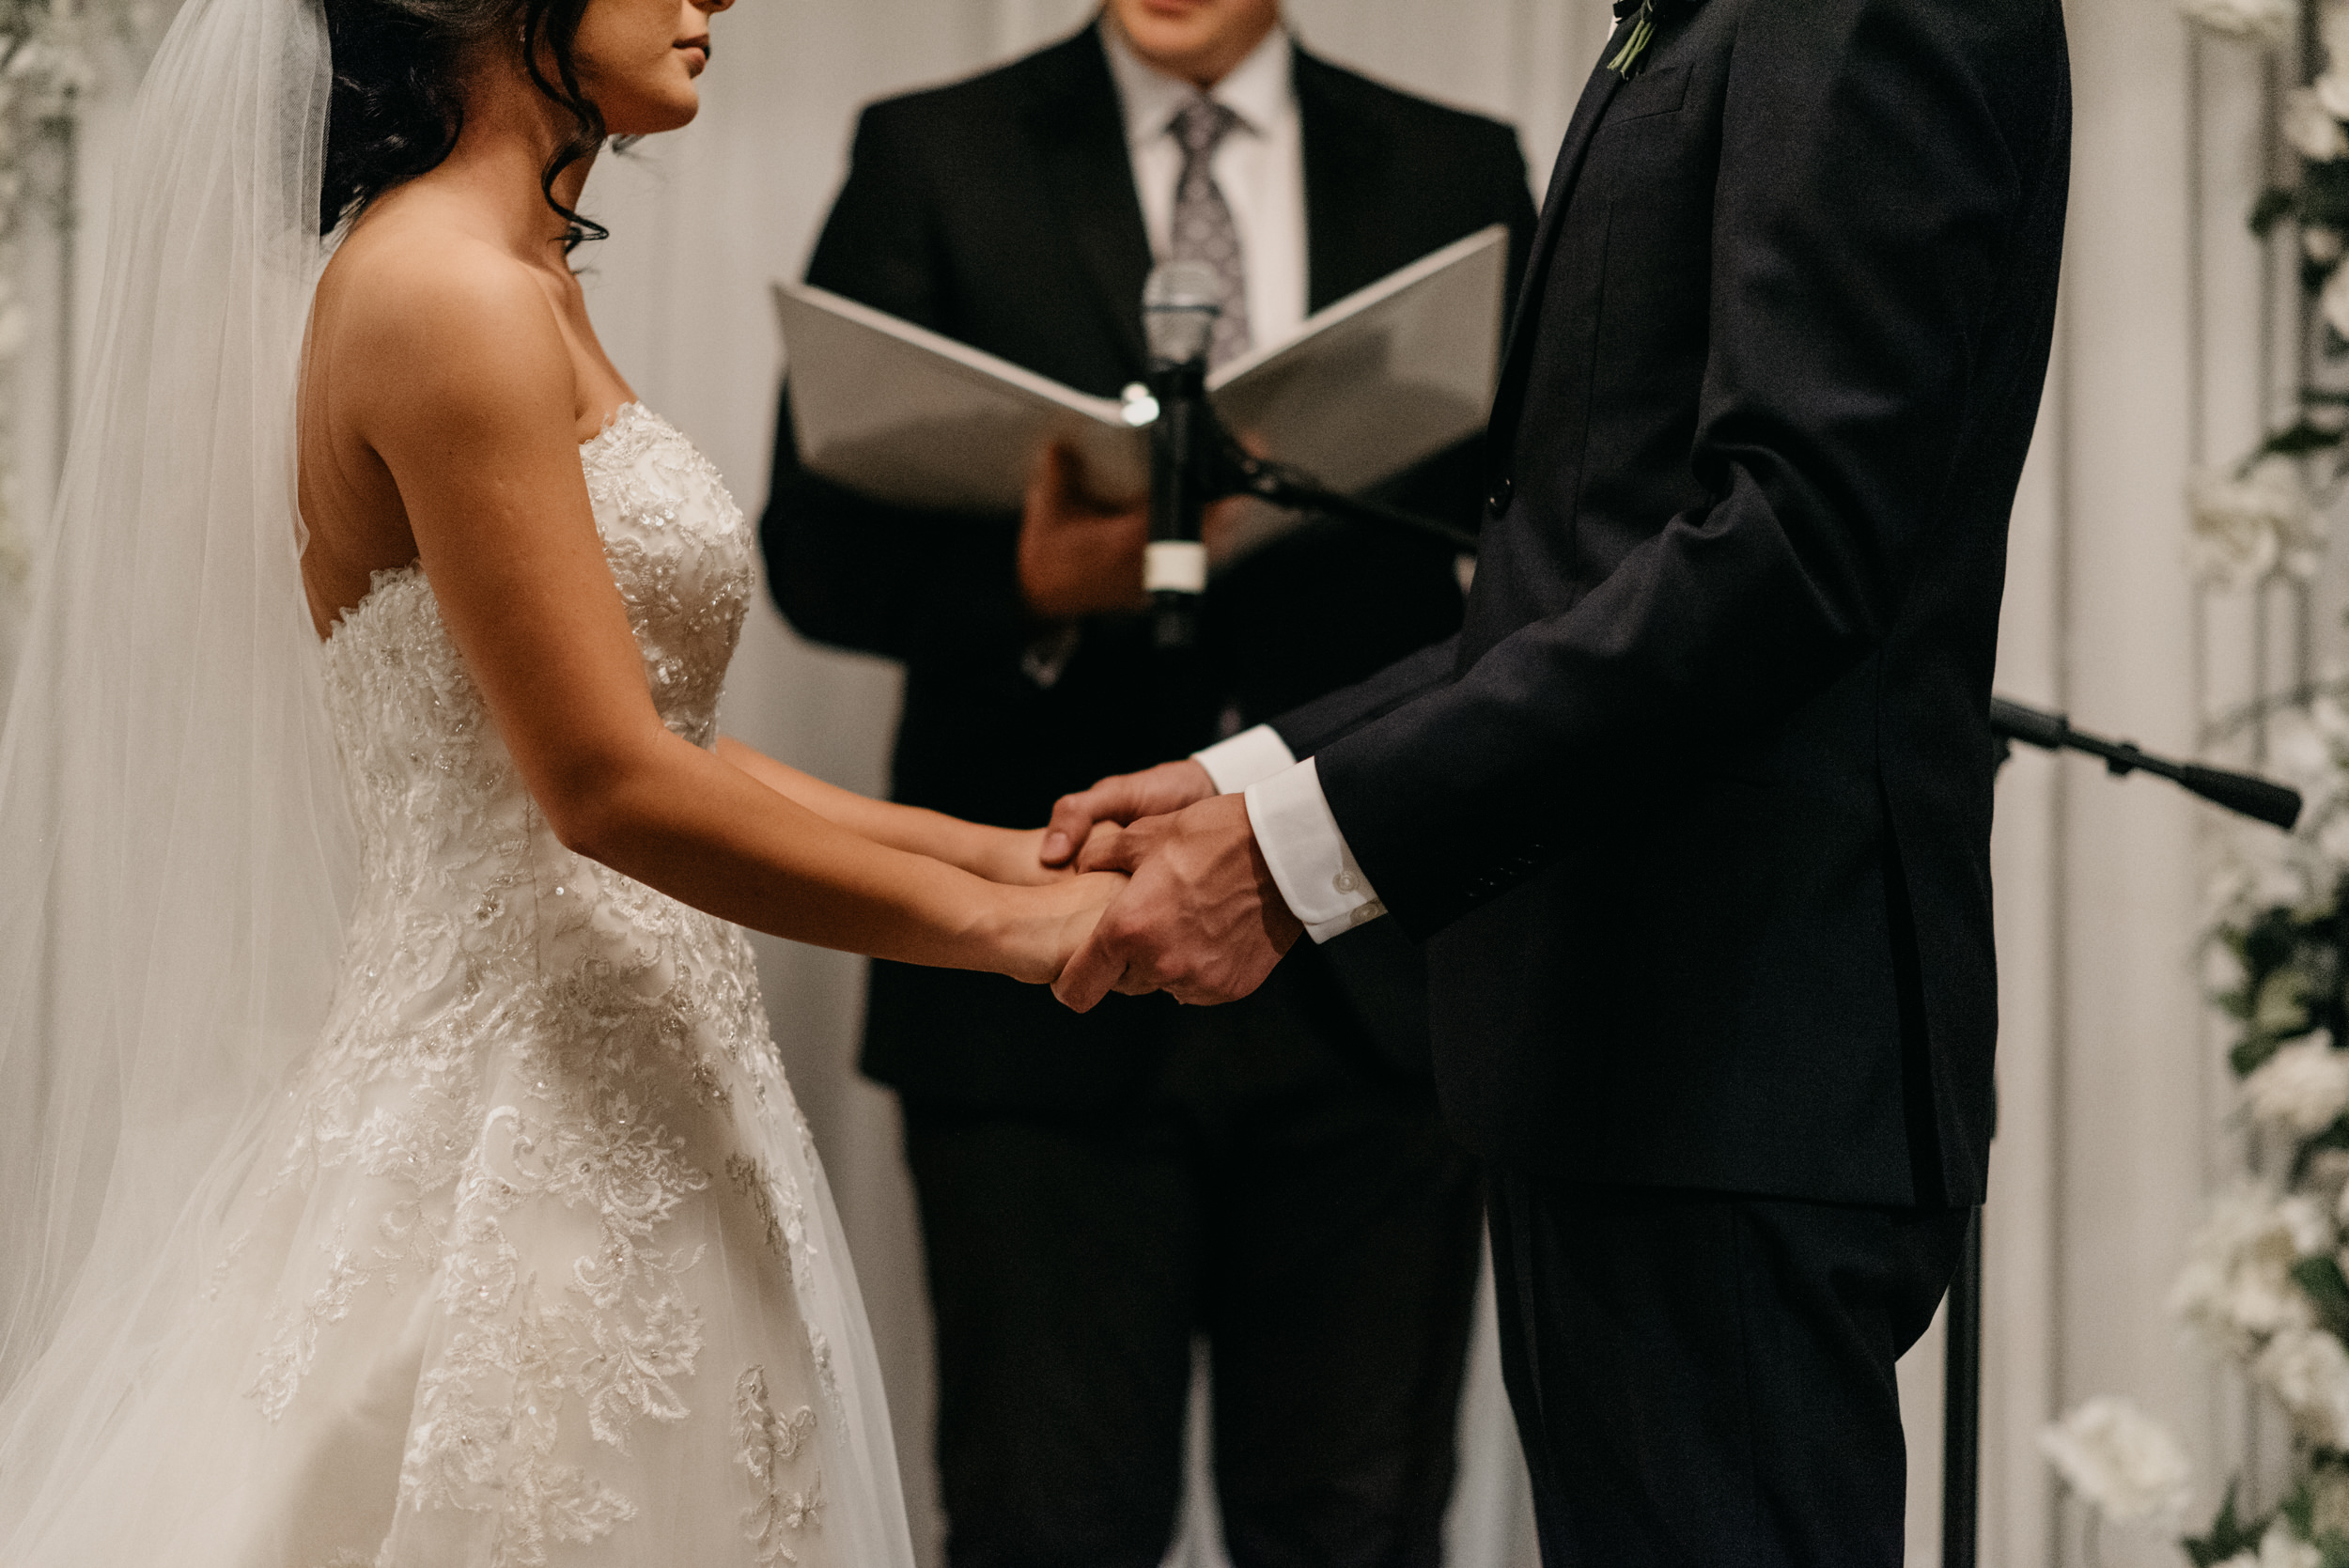 81-ceremony-west-end-ballroom-portland-wedding-venue-9178.jpg